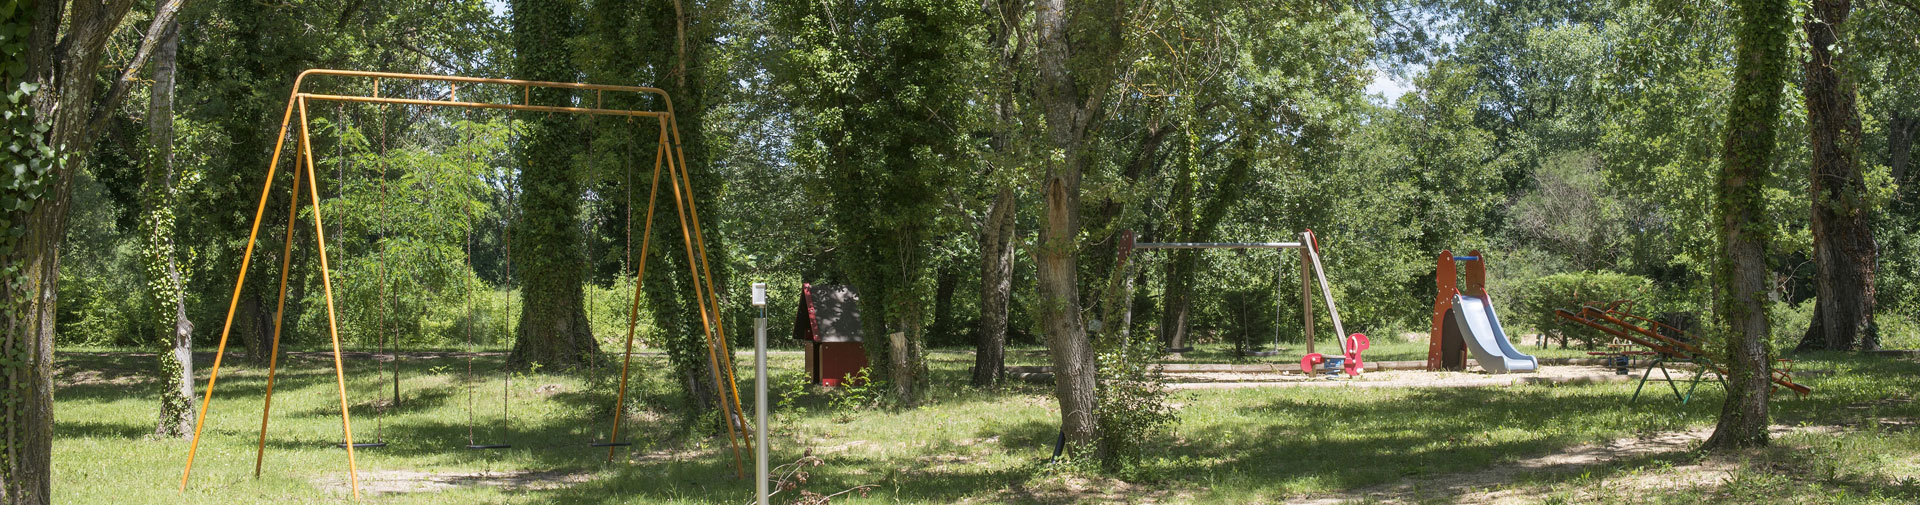 camping-gard-terrain-de-jeux